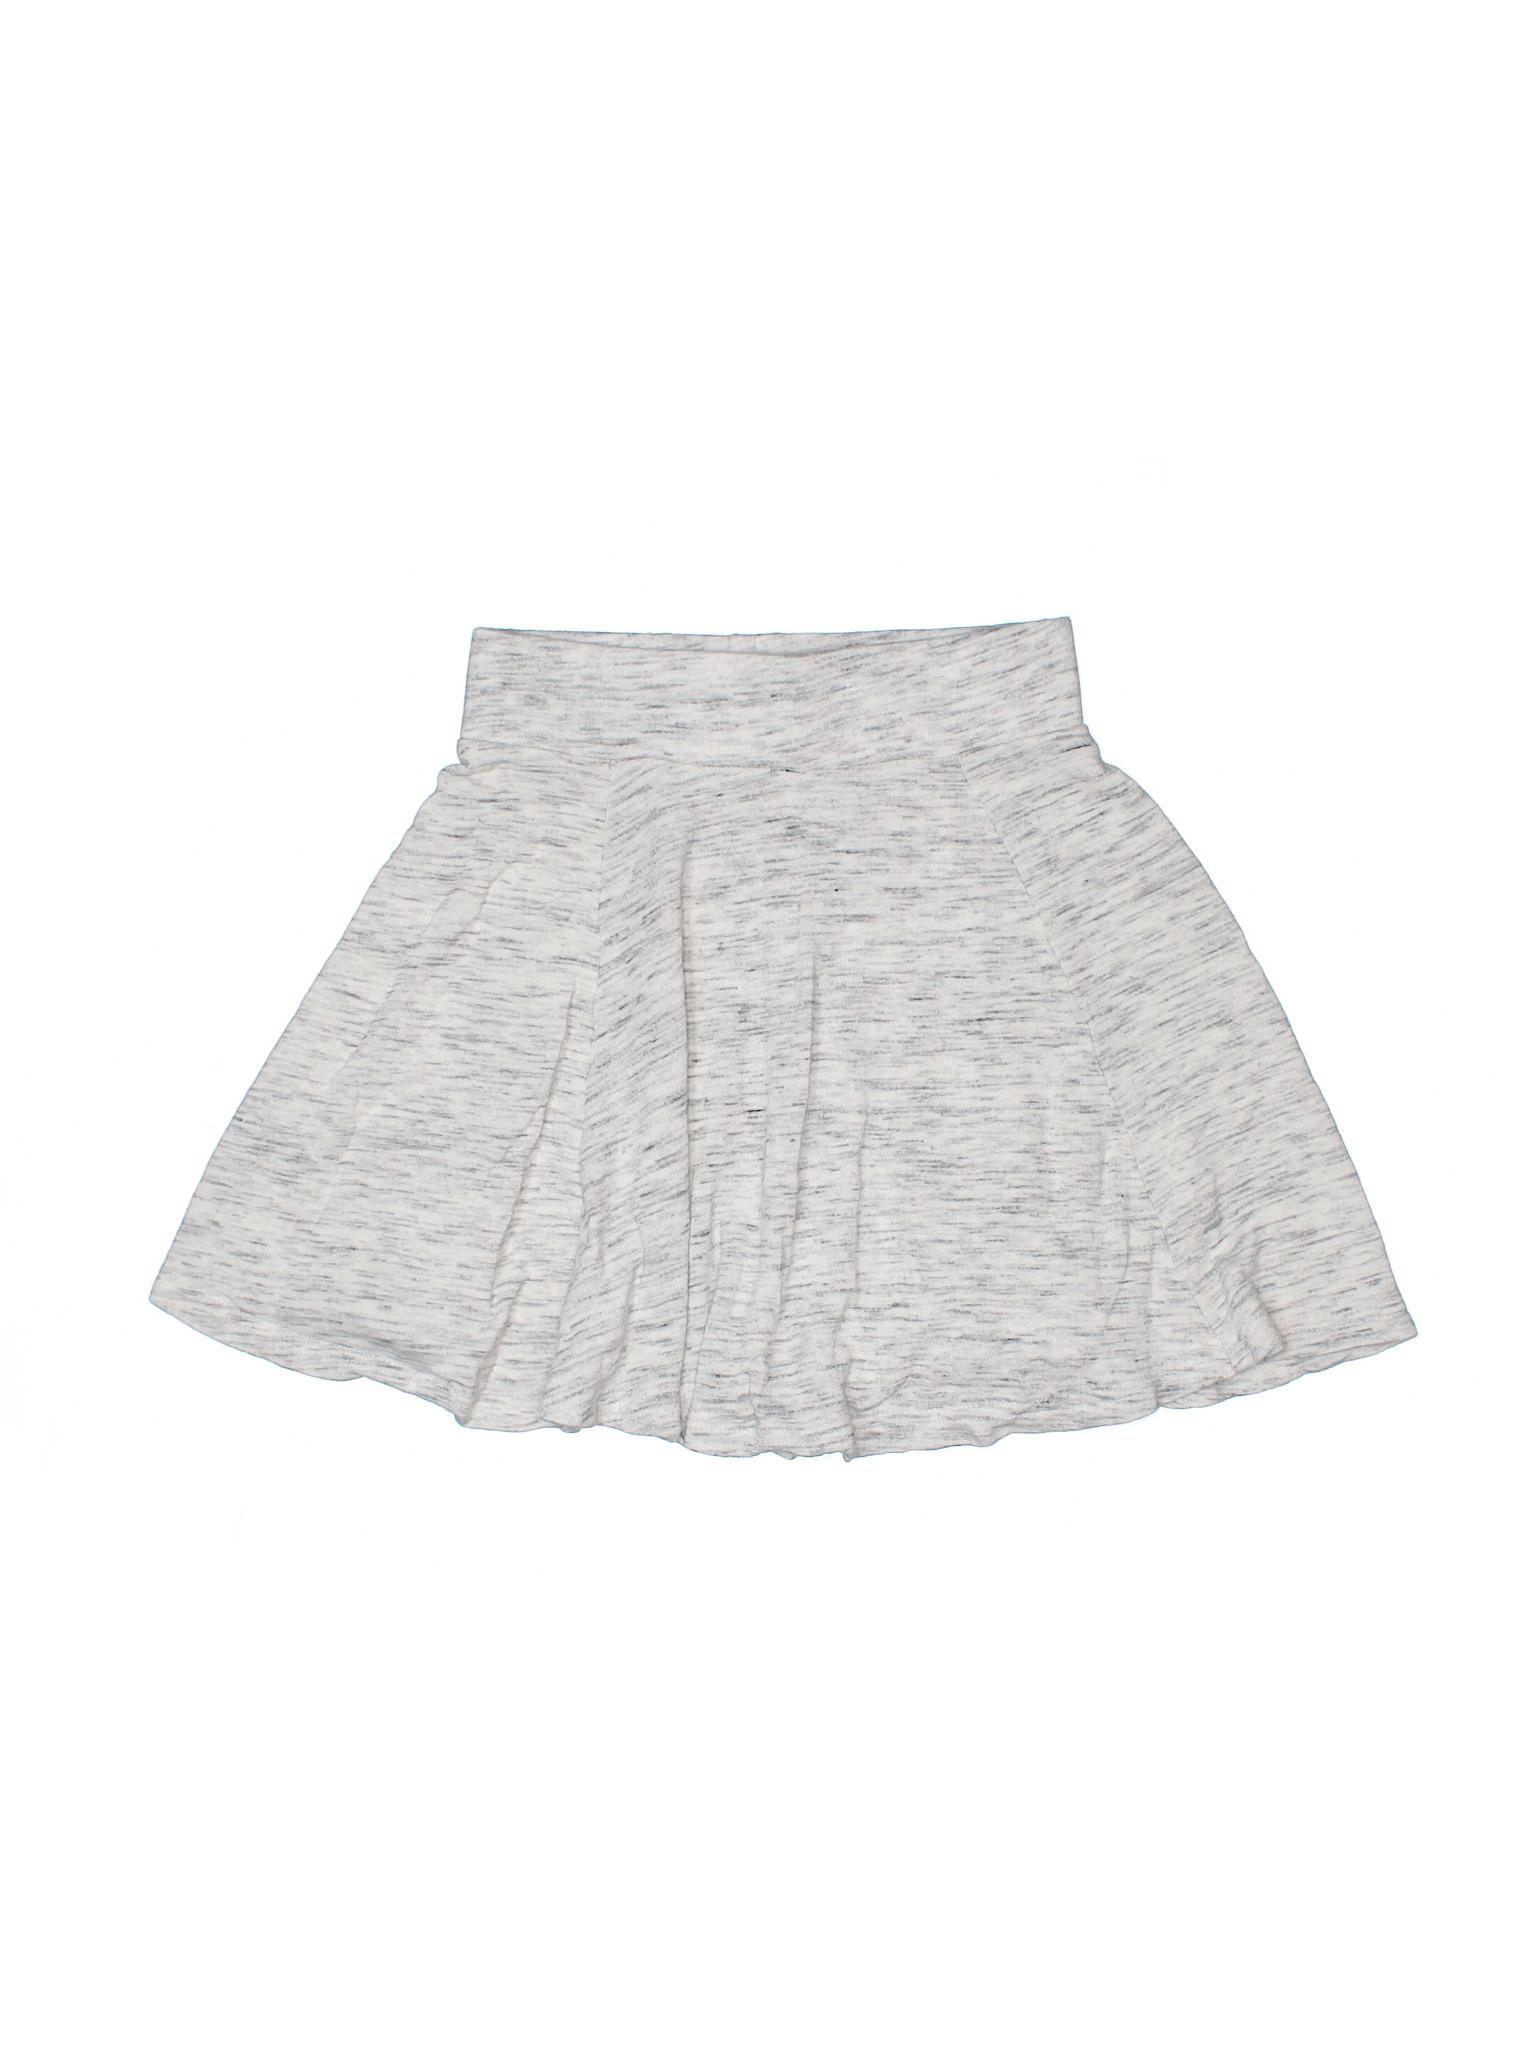 Boutique Boutique Boutique Casual Skirt Boutique Skirt Casual Skirt Casual Casual S5wqg4B